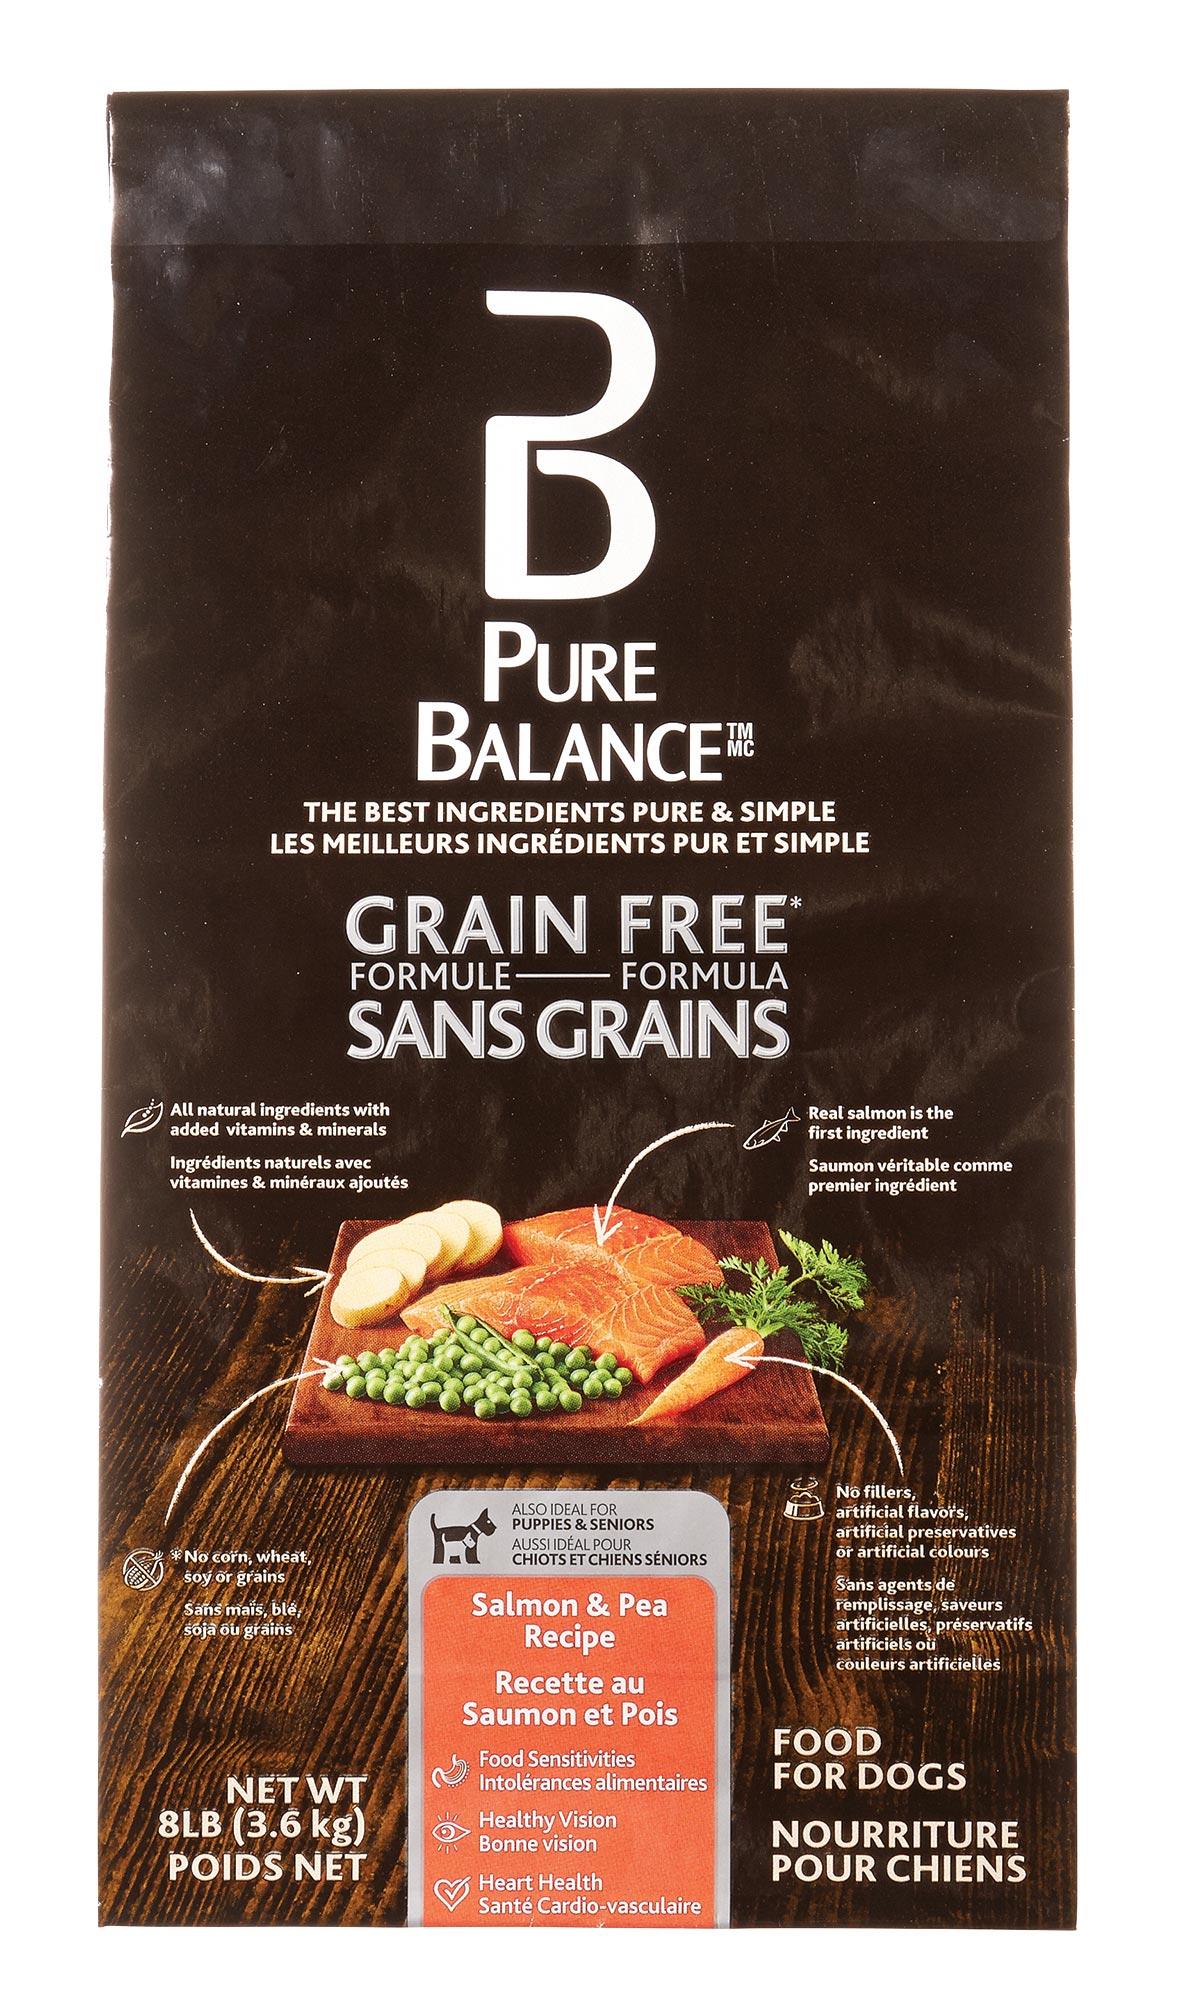 Pure Balance Dog Food Web Site